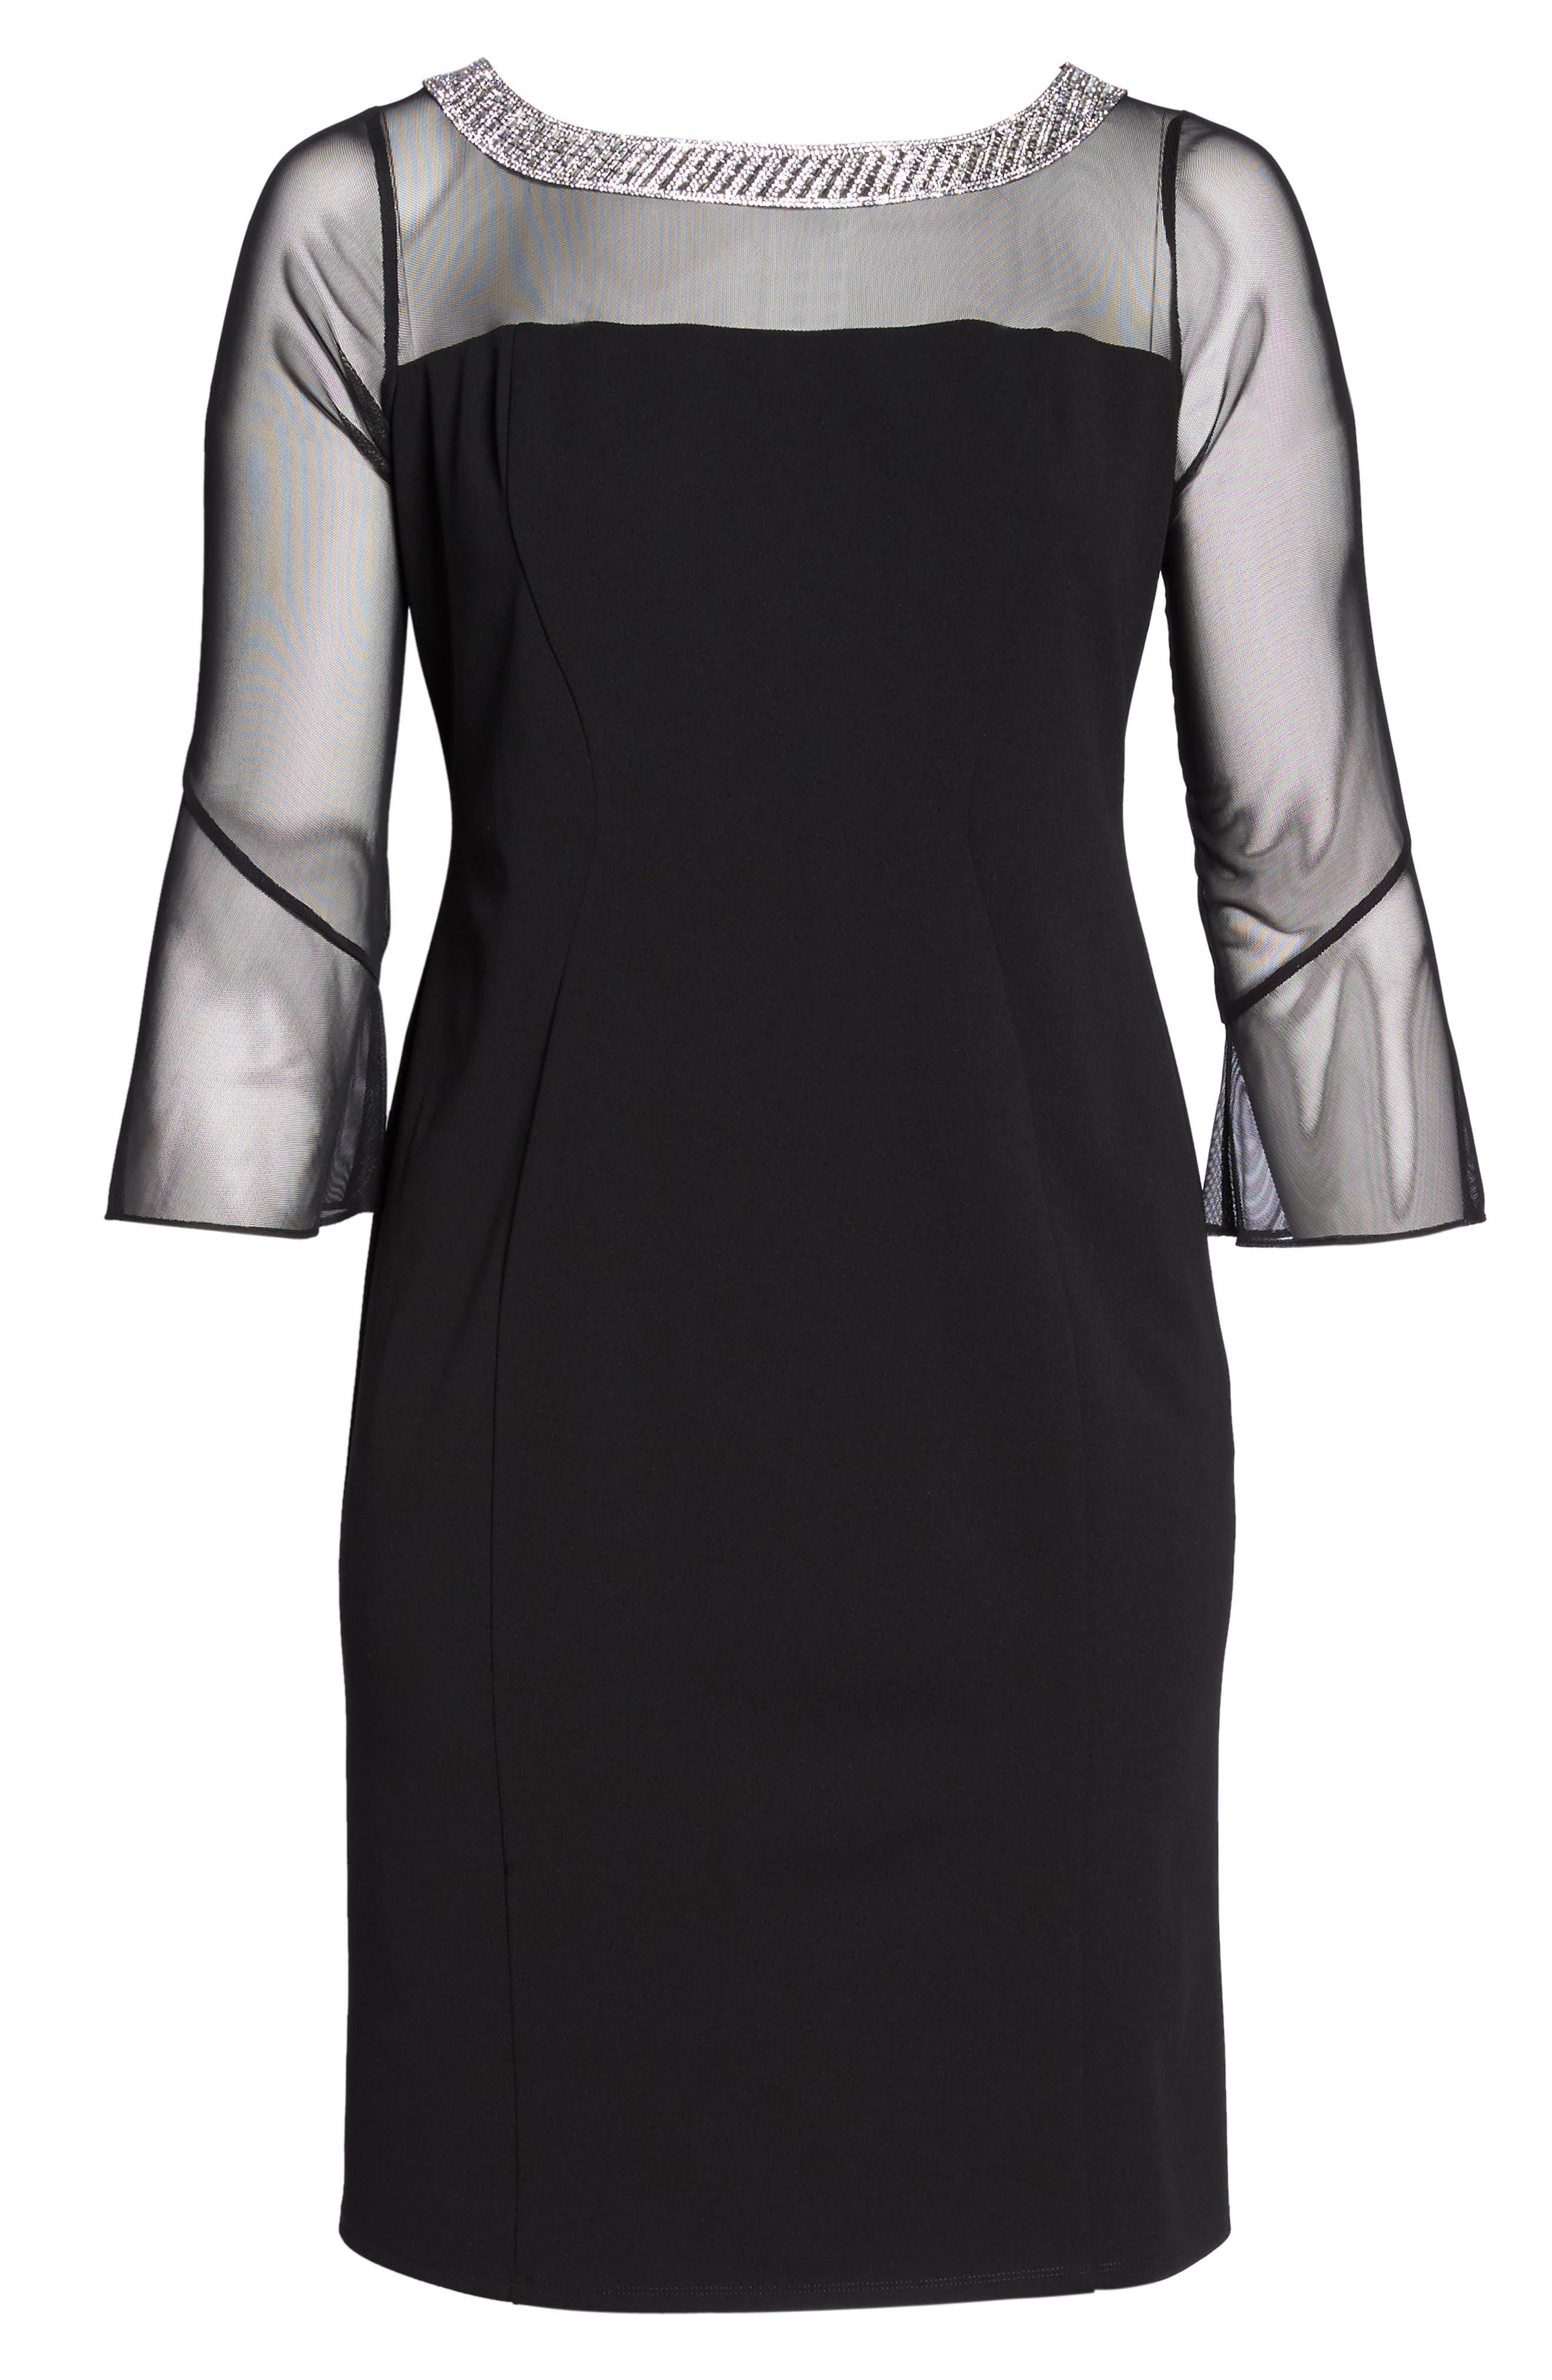 Embellished Illusion Shift Dress,                             Alternate thumbnail 6, color,                             BLACK